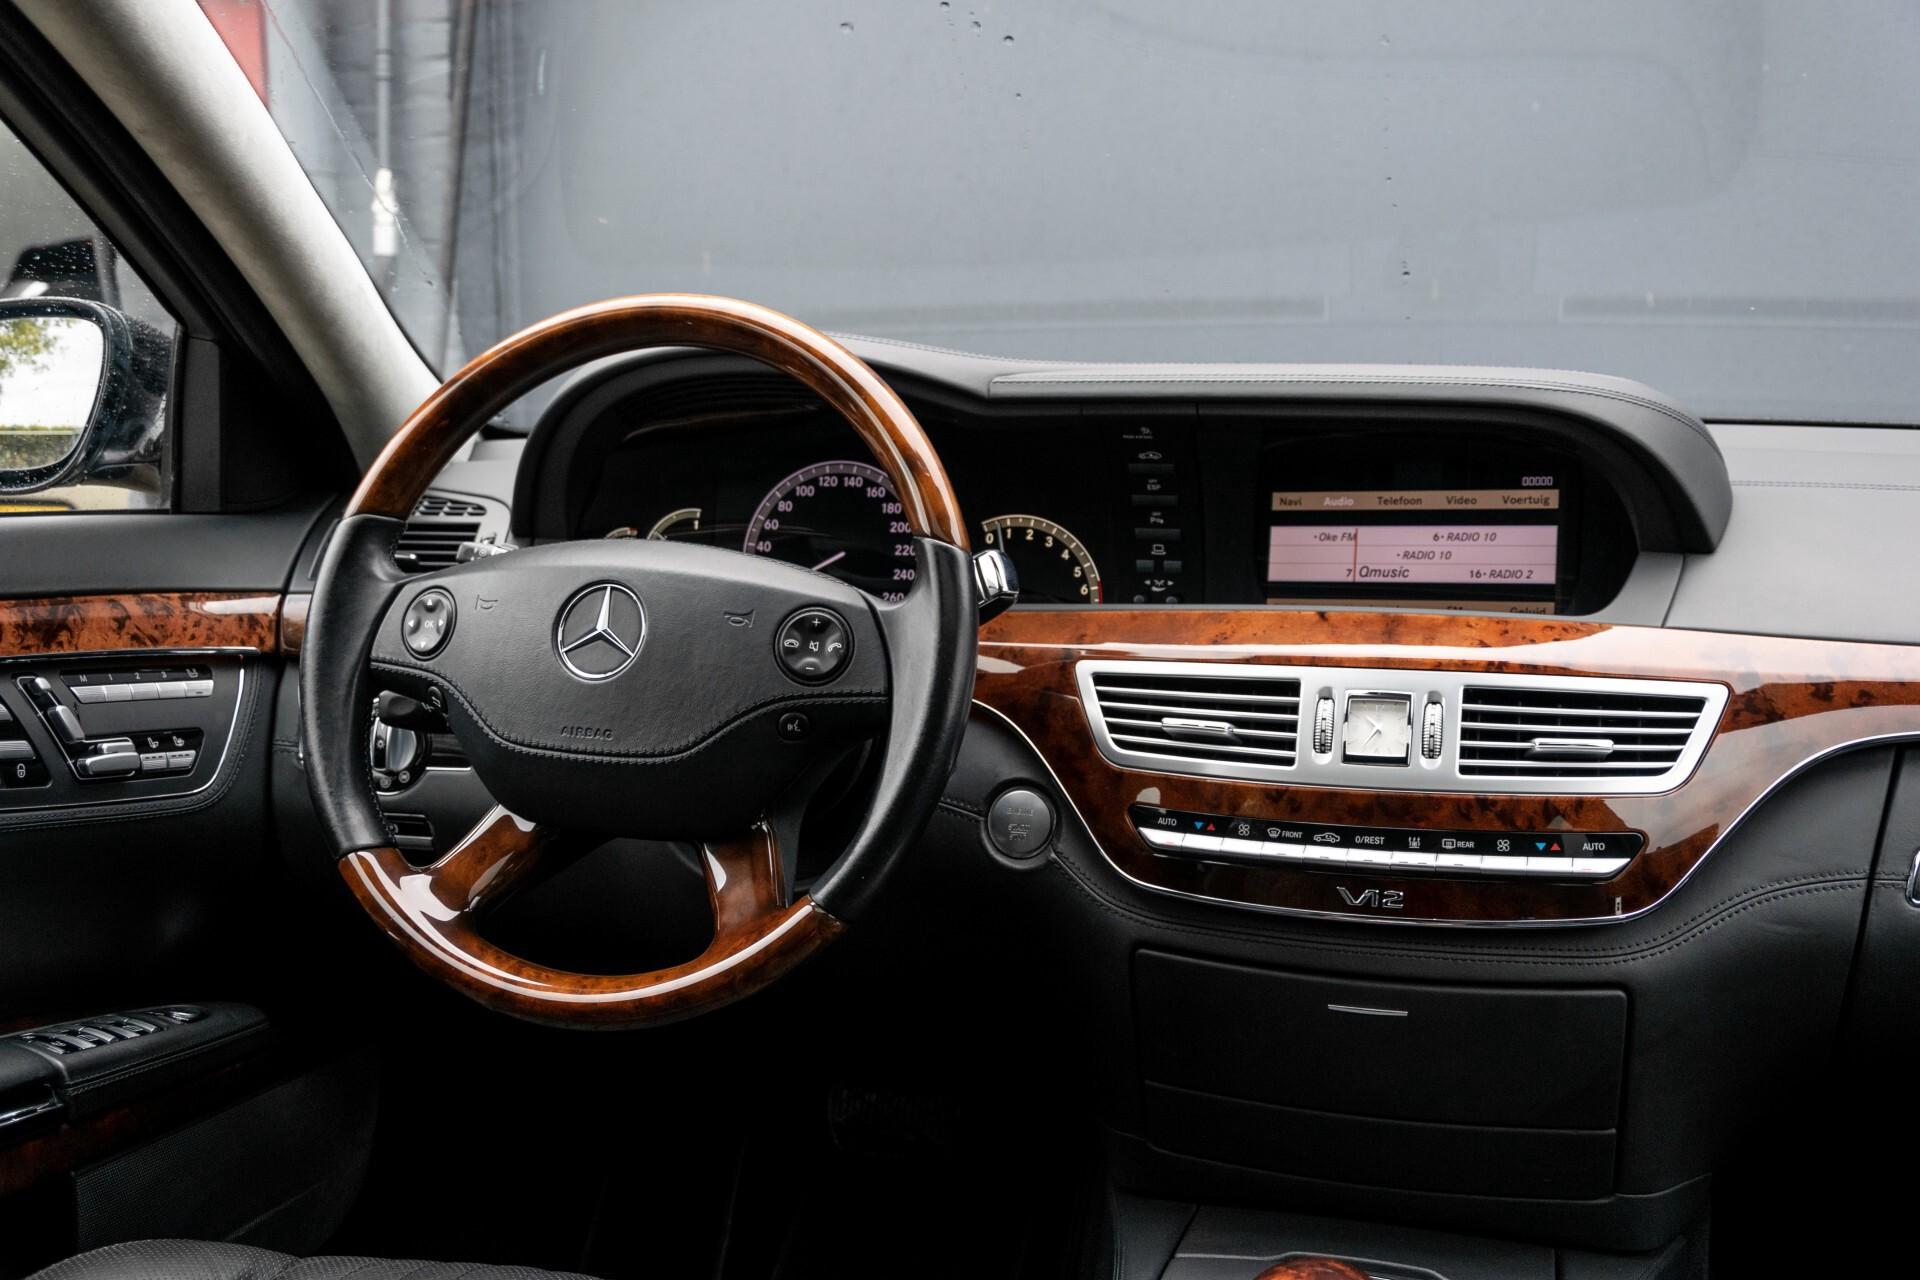 Mercedes-Benz S-Klasse 600 Lang 65 AMG Bi-Turbo Prestige Plus Aut5 Foto 7